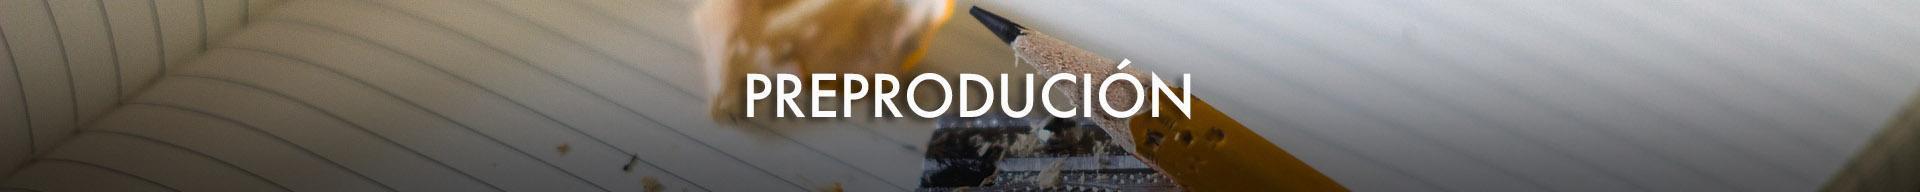 preproducion